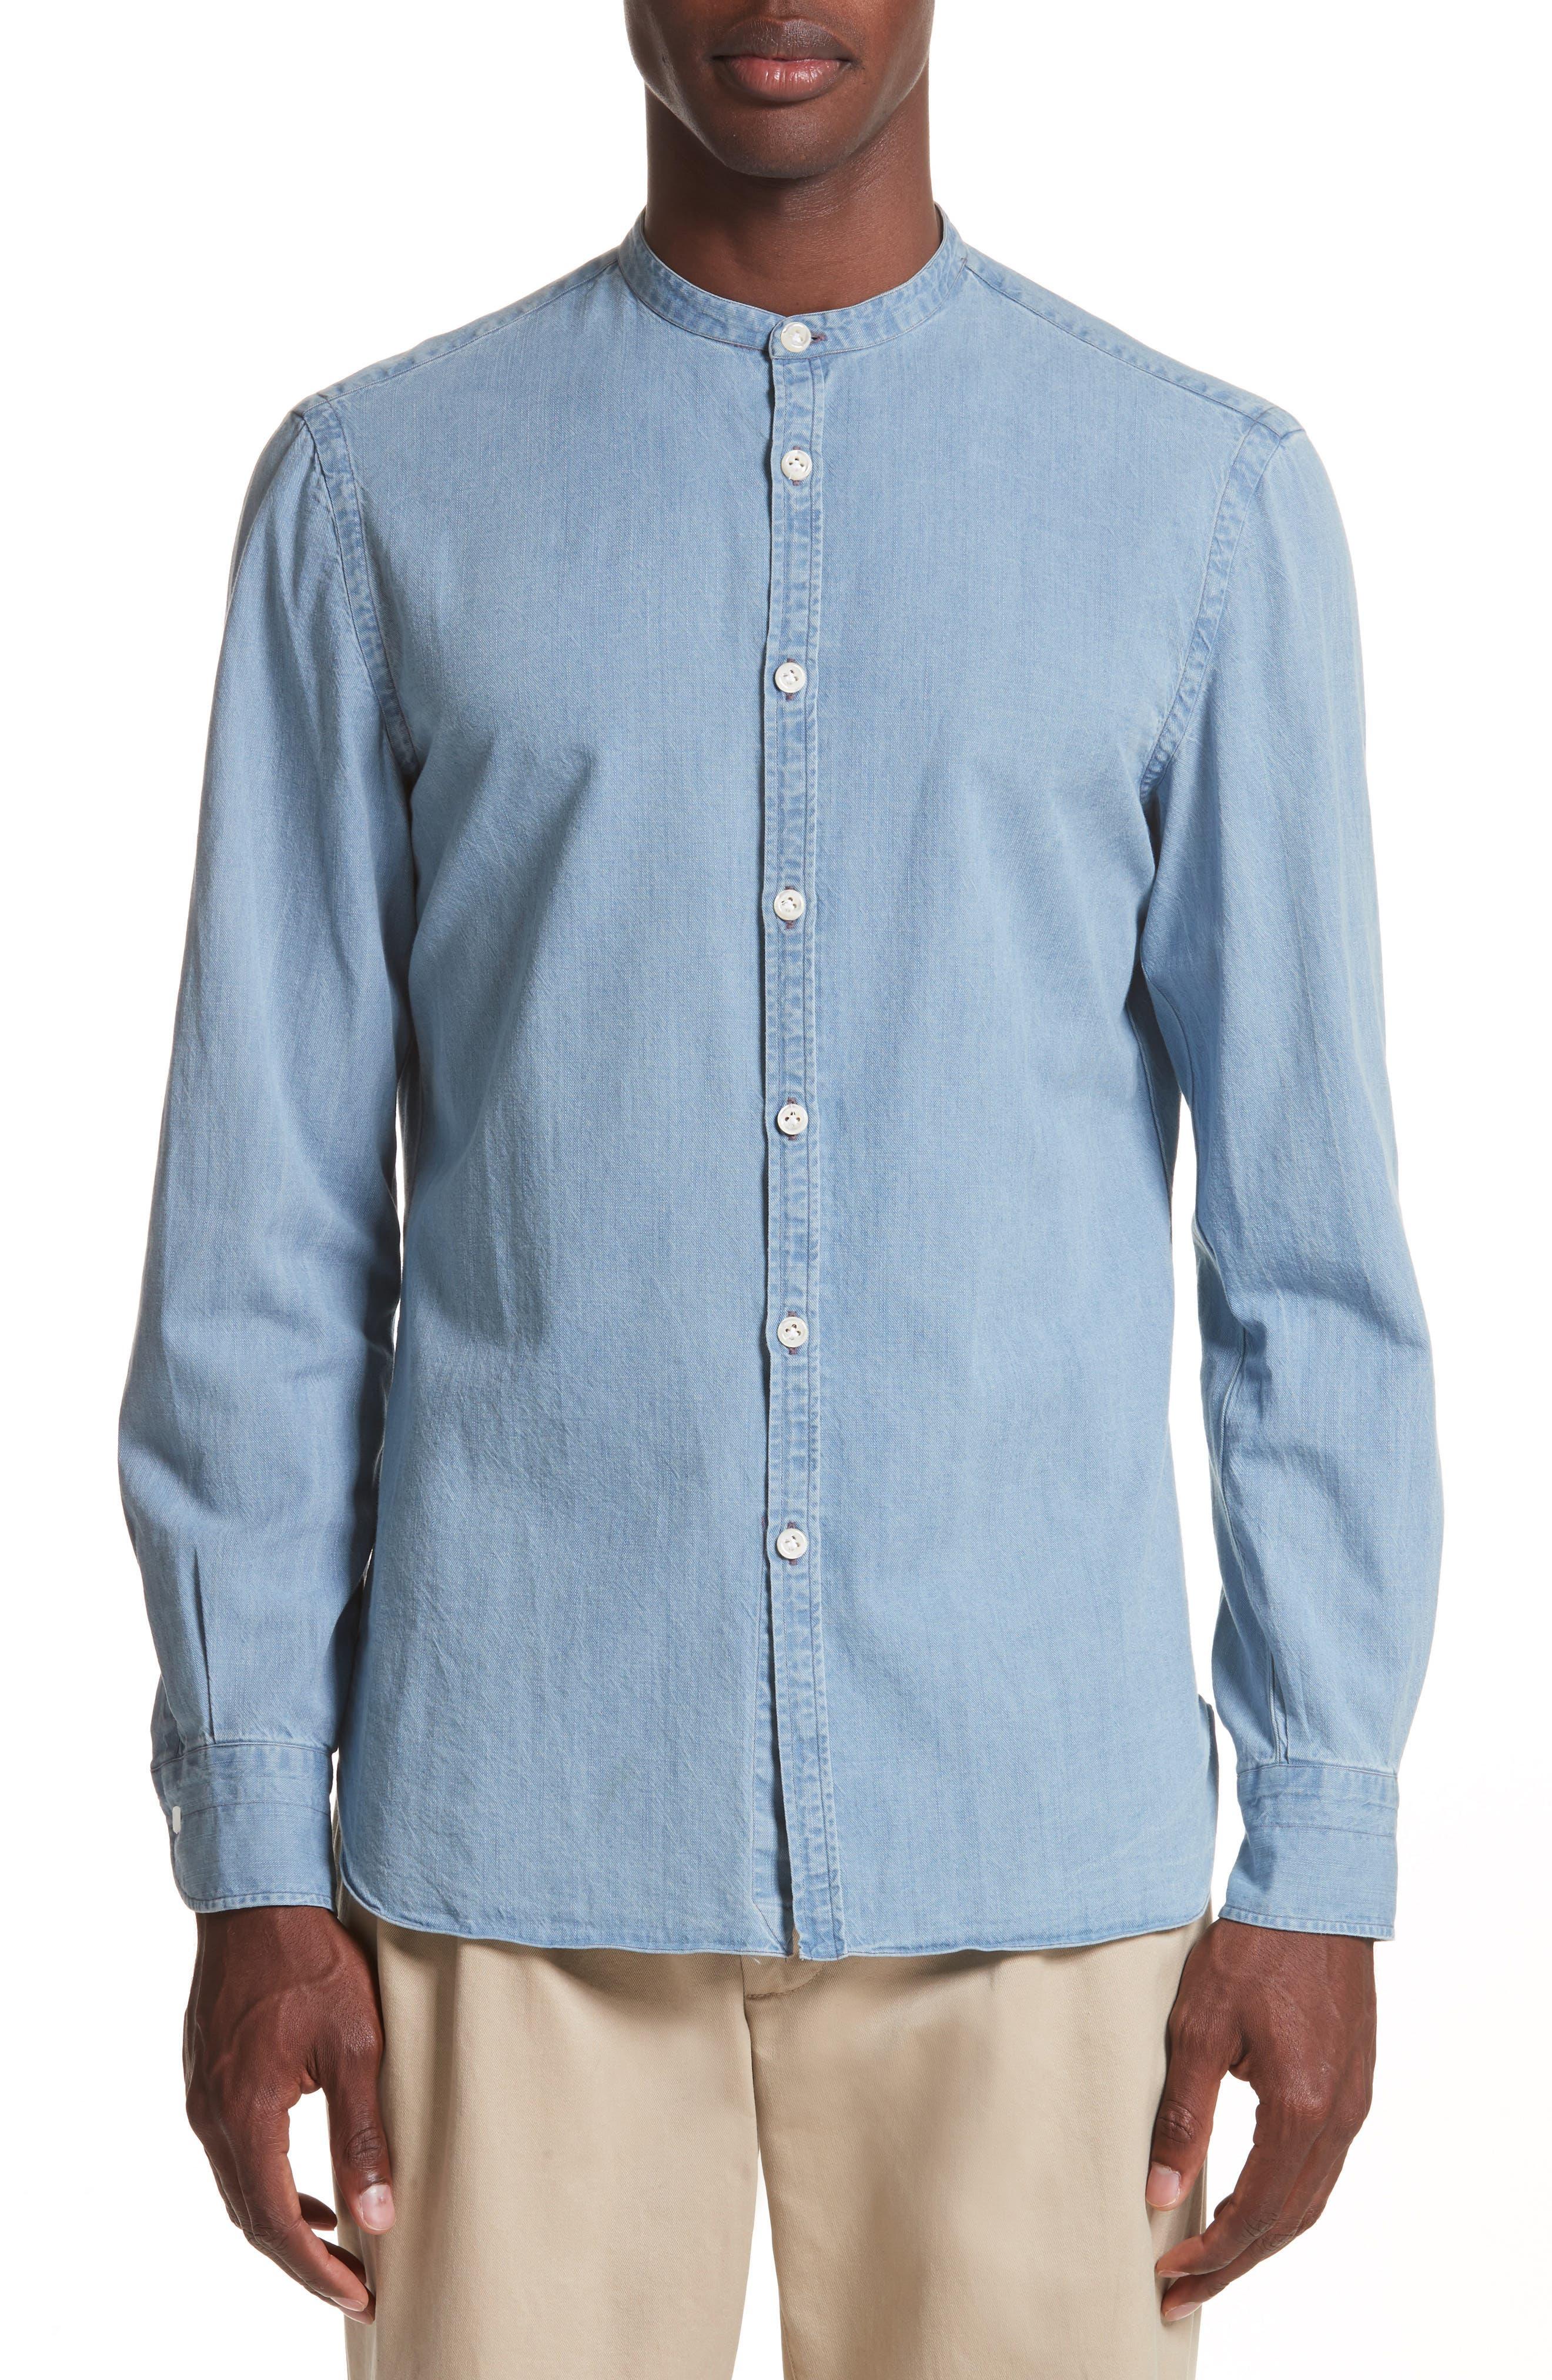 Napoli Washed Denim Band Collar Shirt,                         Main,                         color, 451